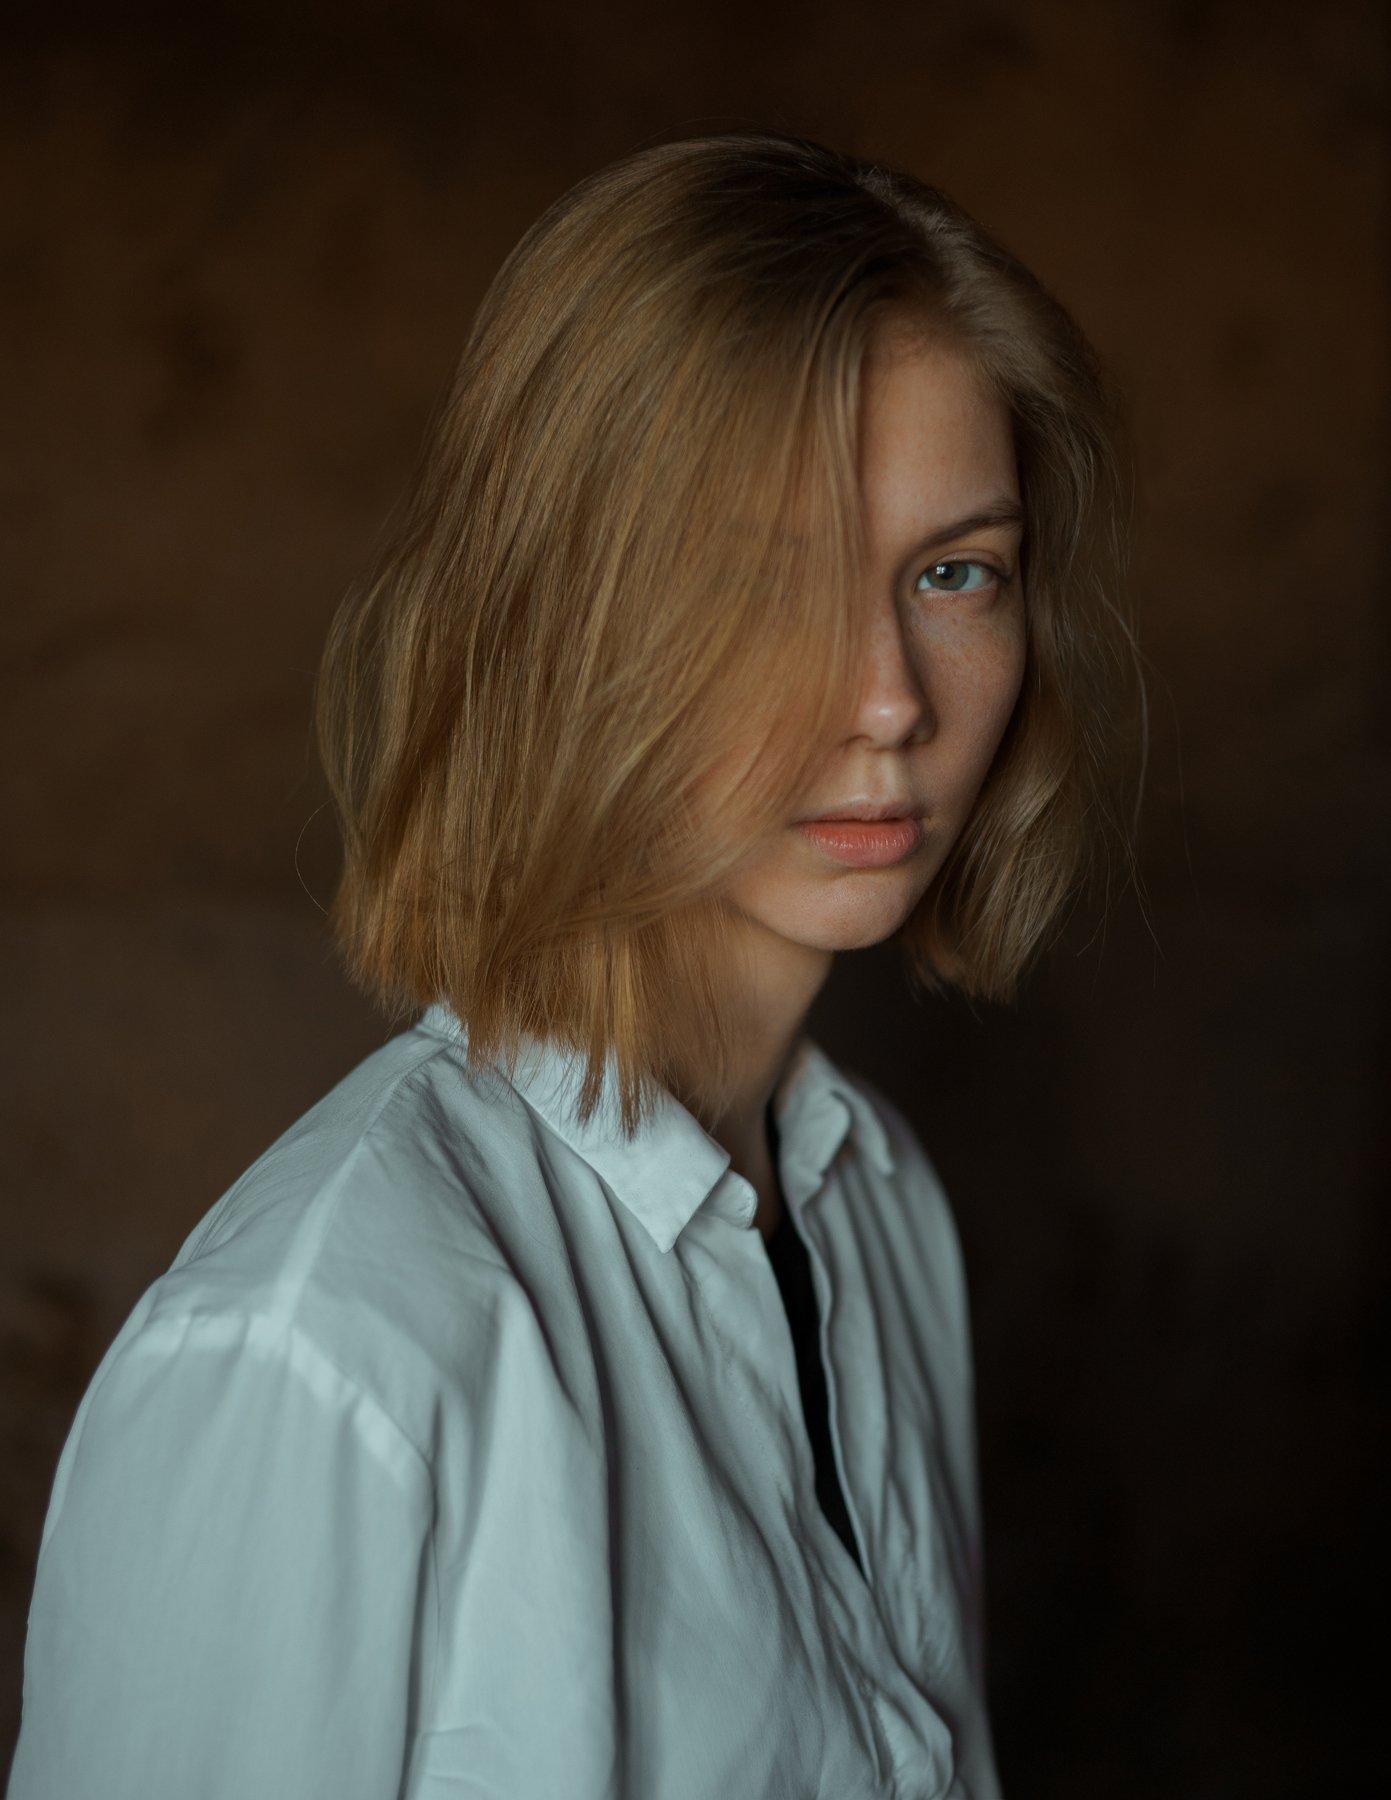 portrait, портрет, girl, indoor, studio, девушка, glass, march, ламповый, retouch, ретушь, цвет, lamp, sony, Фишар Павел